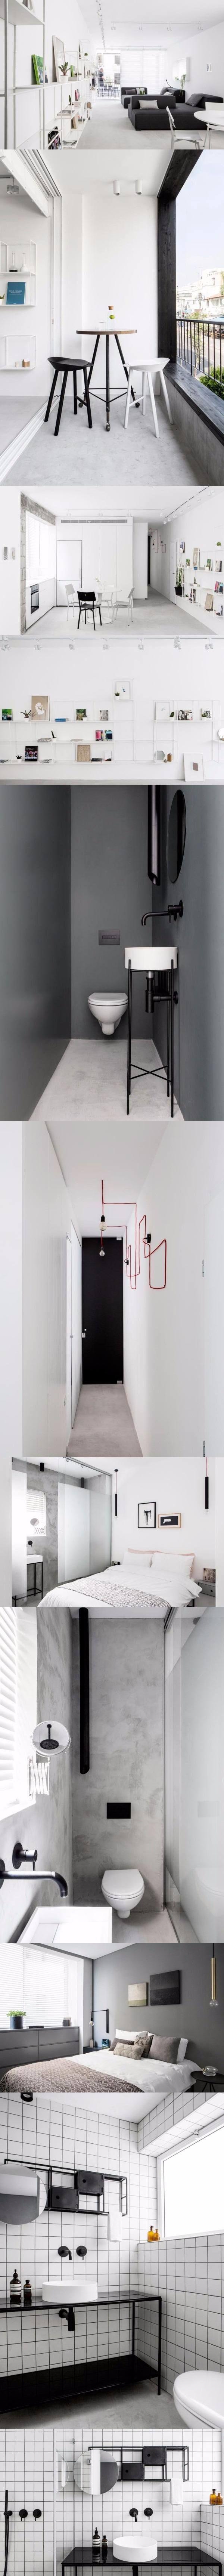 Apartamento minimalista /http://design-milk.com/